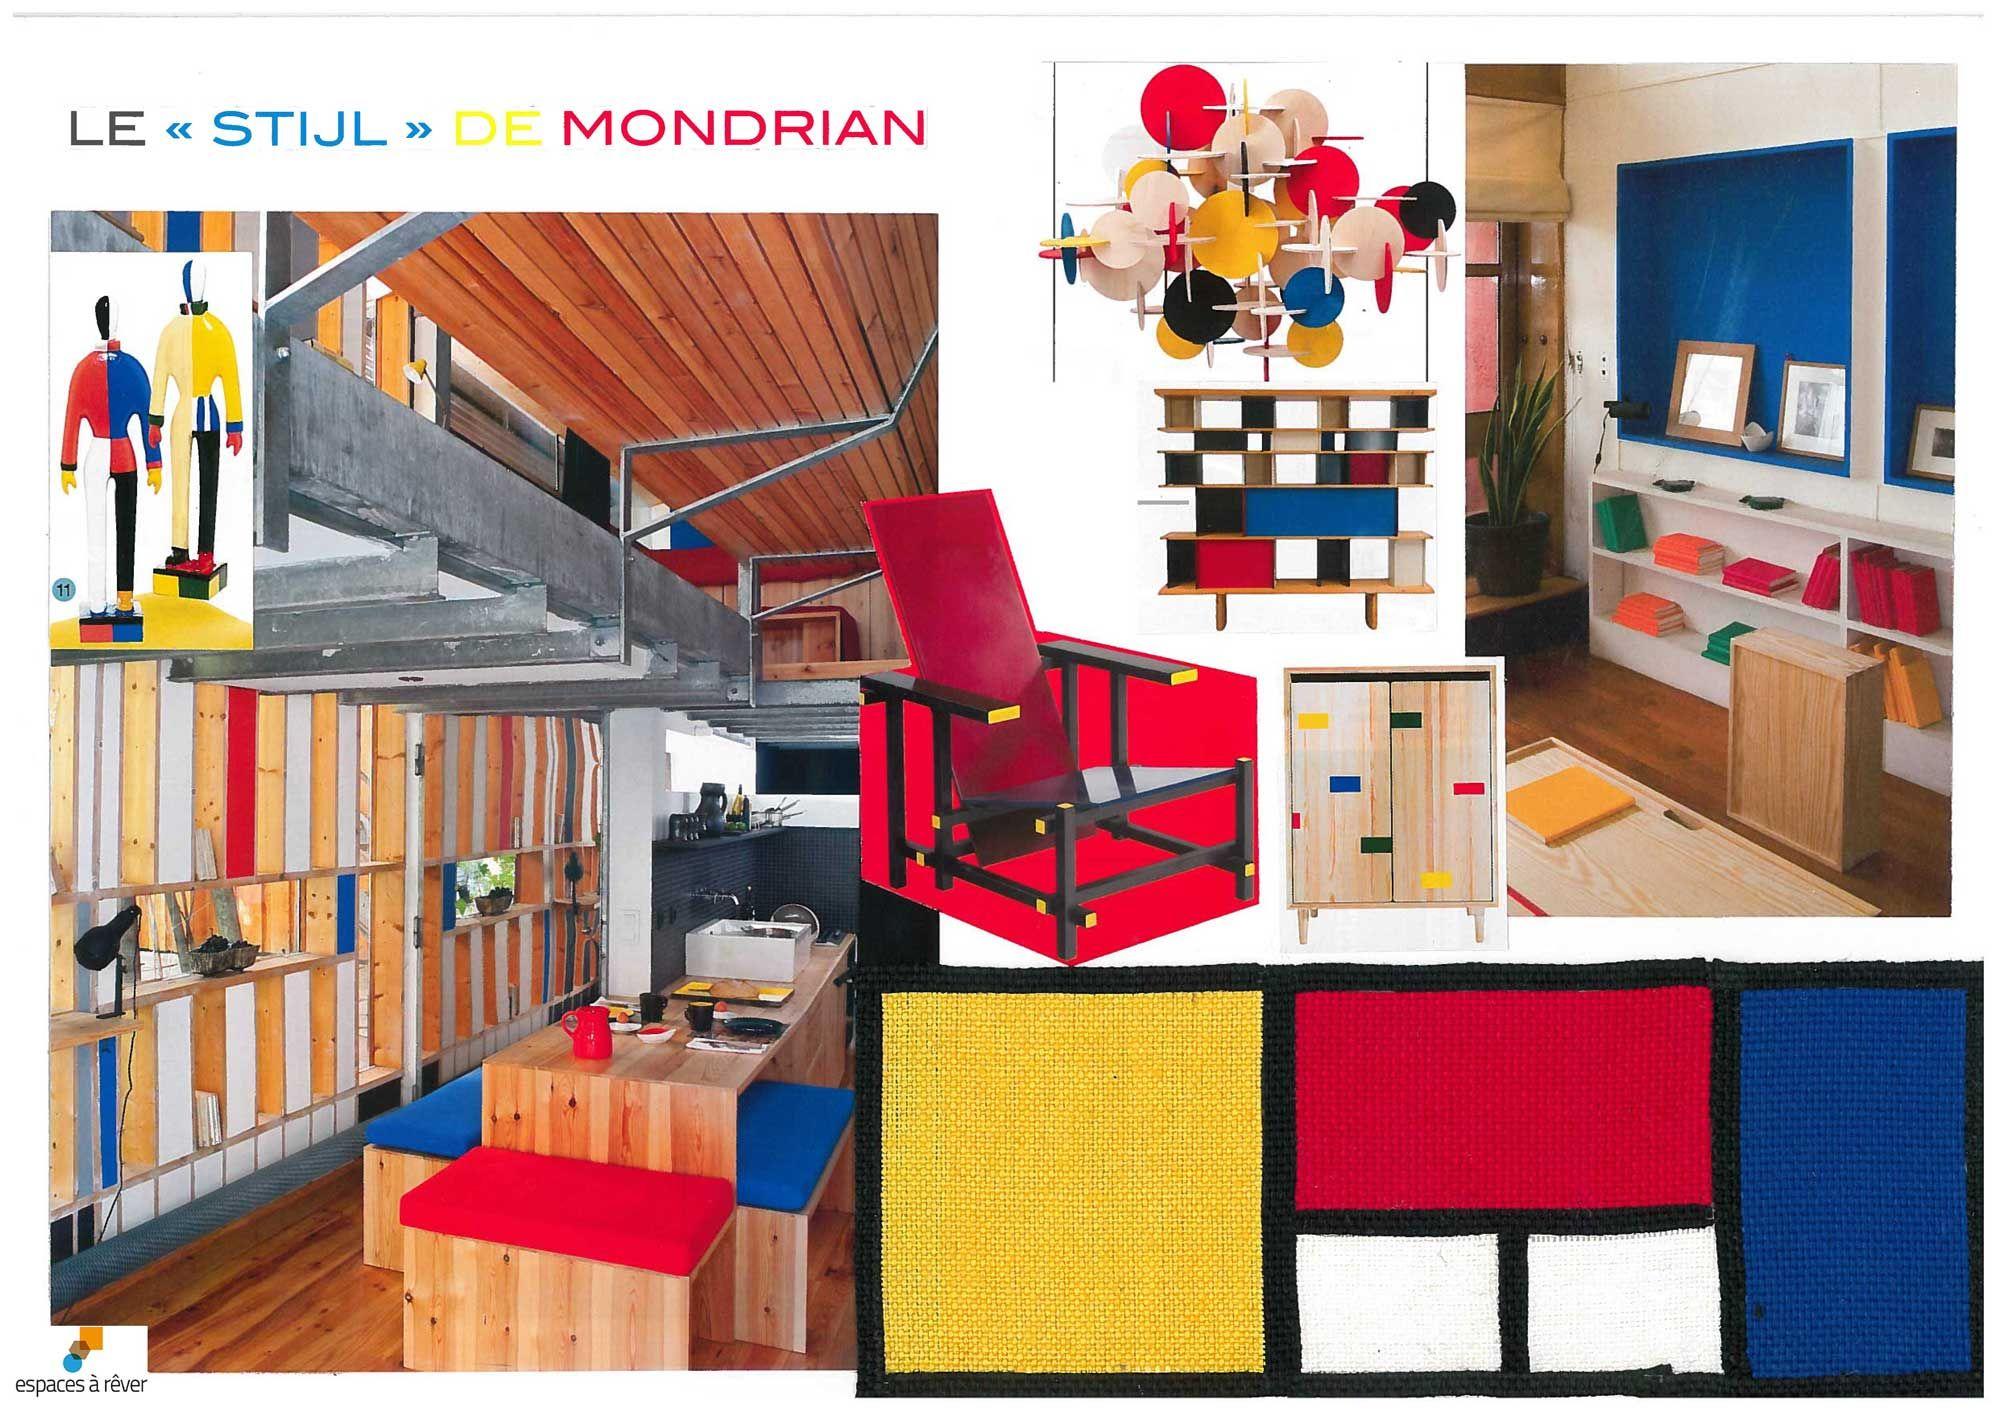 espaces r ver planche ambiance style hommage mondrian planches de style pinterest. Black Bedroom Furniture Sets. Home Design Ideas